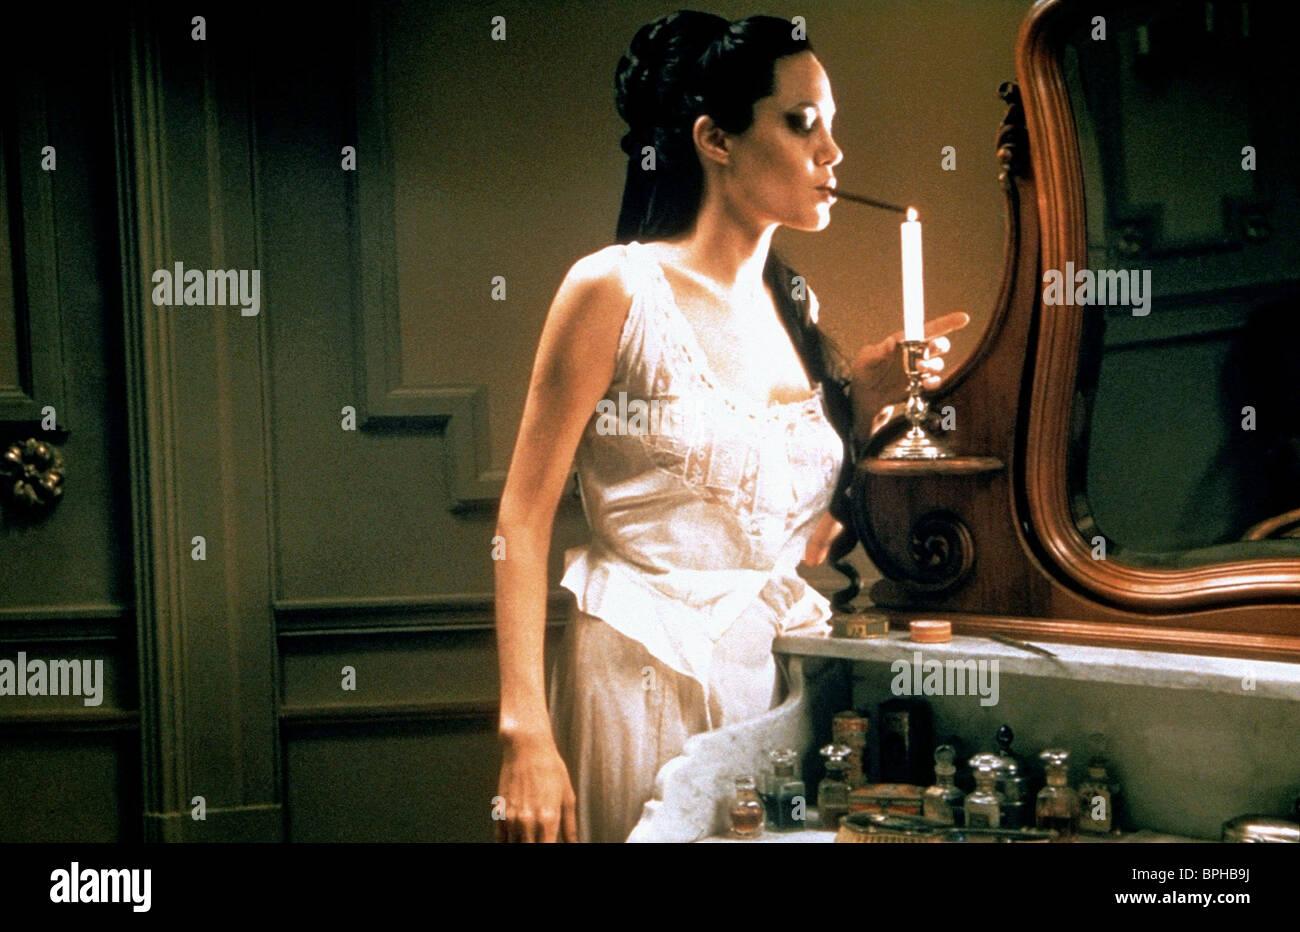 Angelina Jolie Original Sin angelina jolie original sin film stock photos & angelina